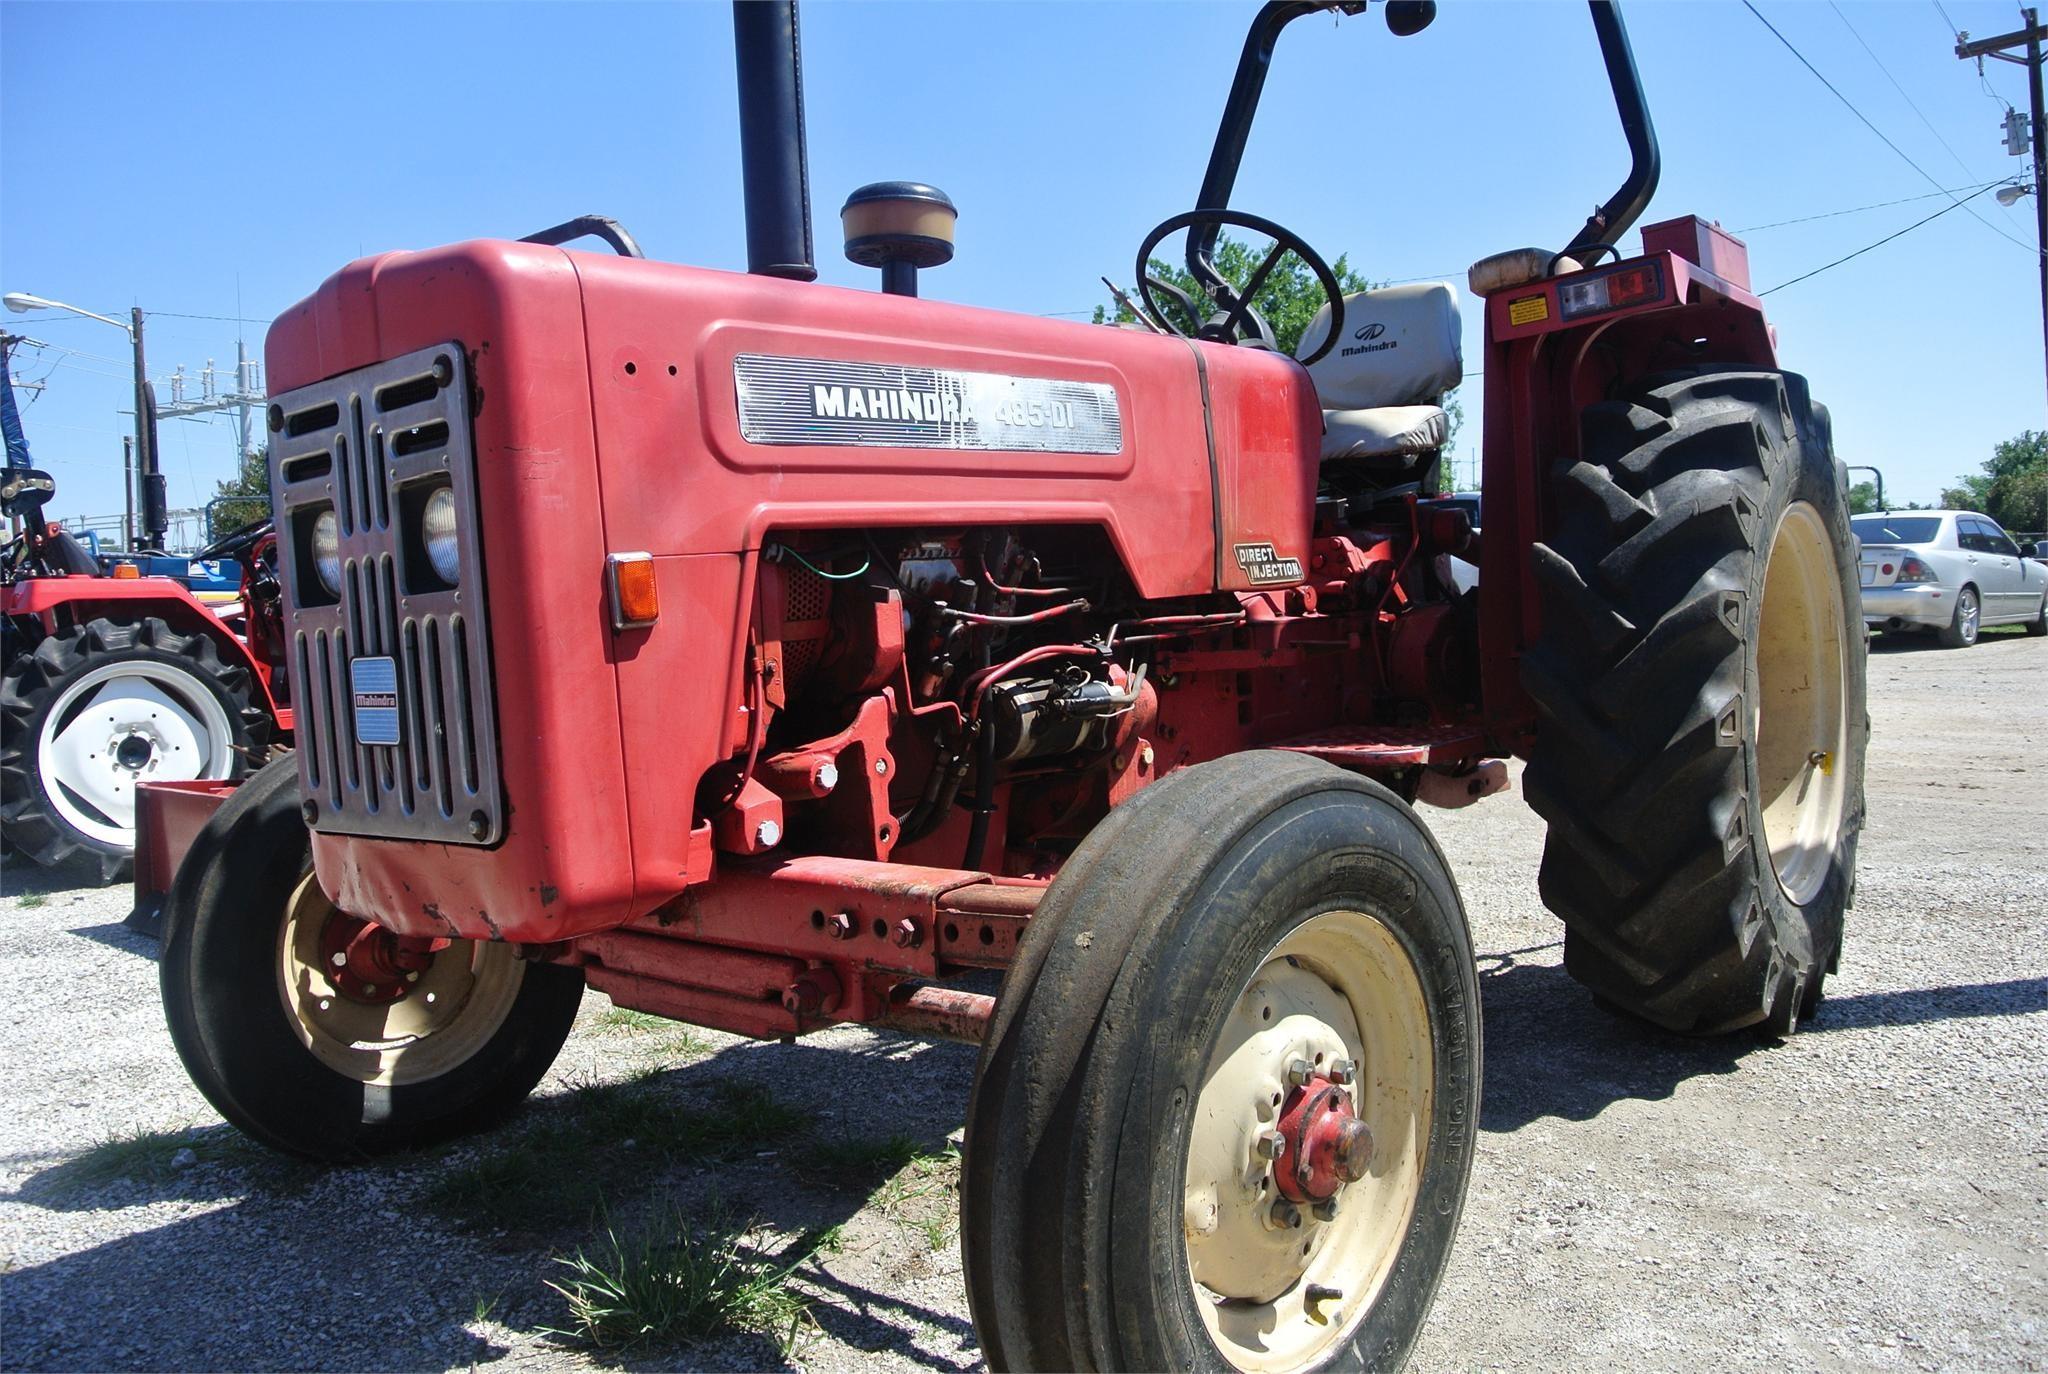 MAHINDRA 485-DI 40-99 HP Tractor